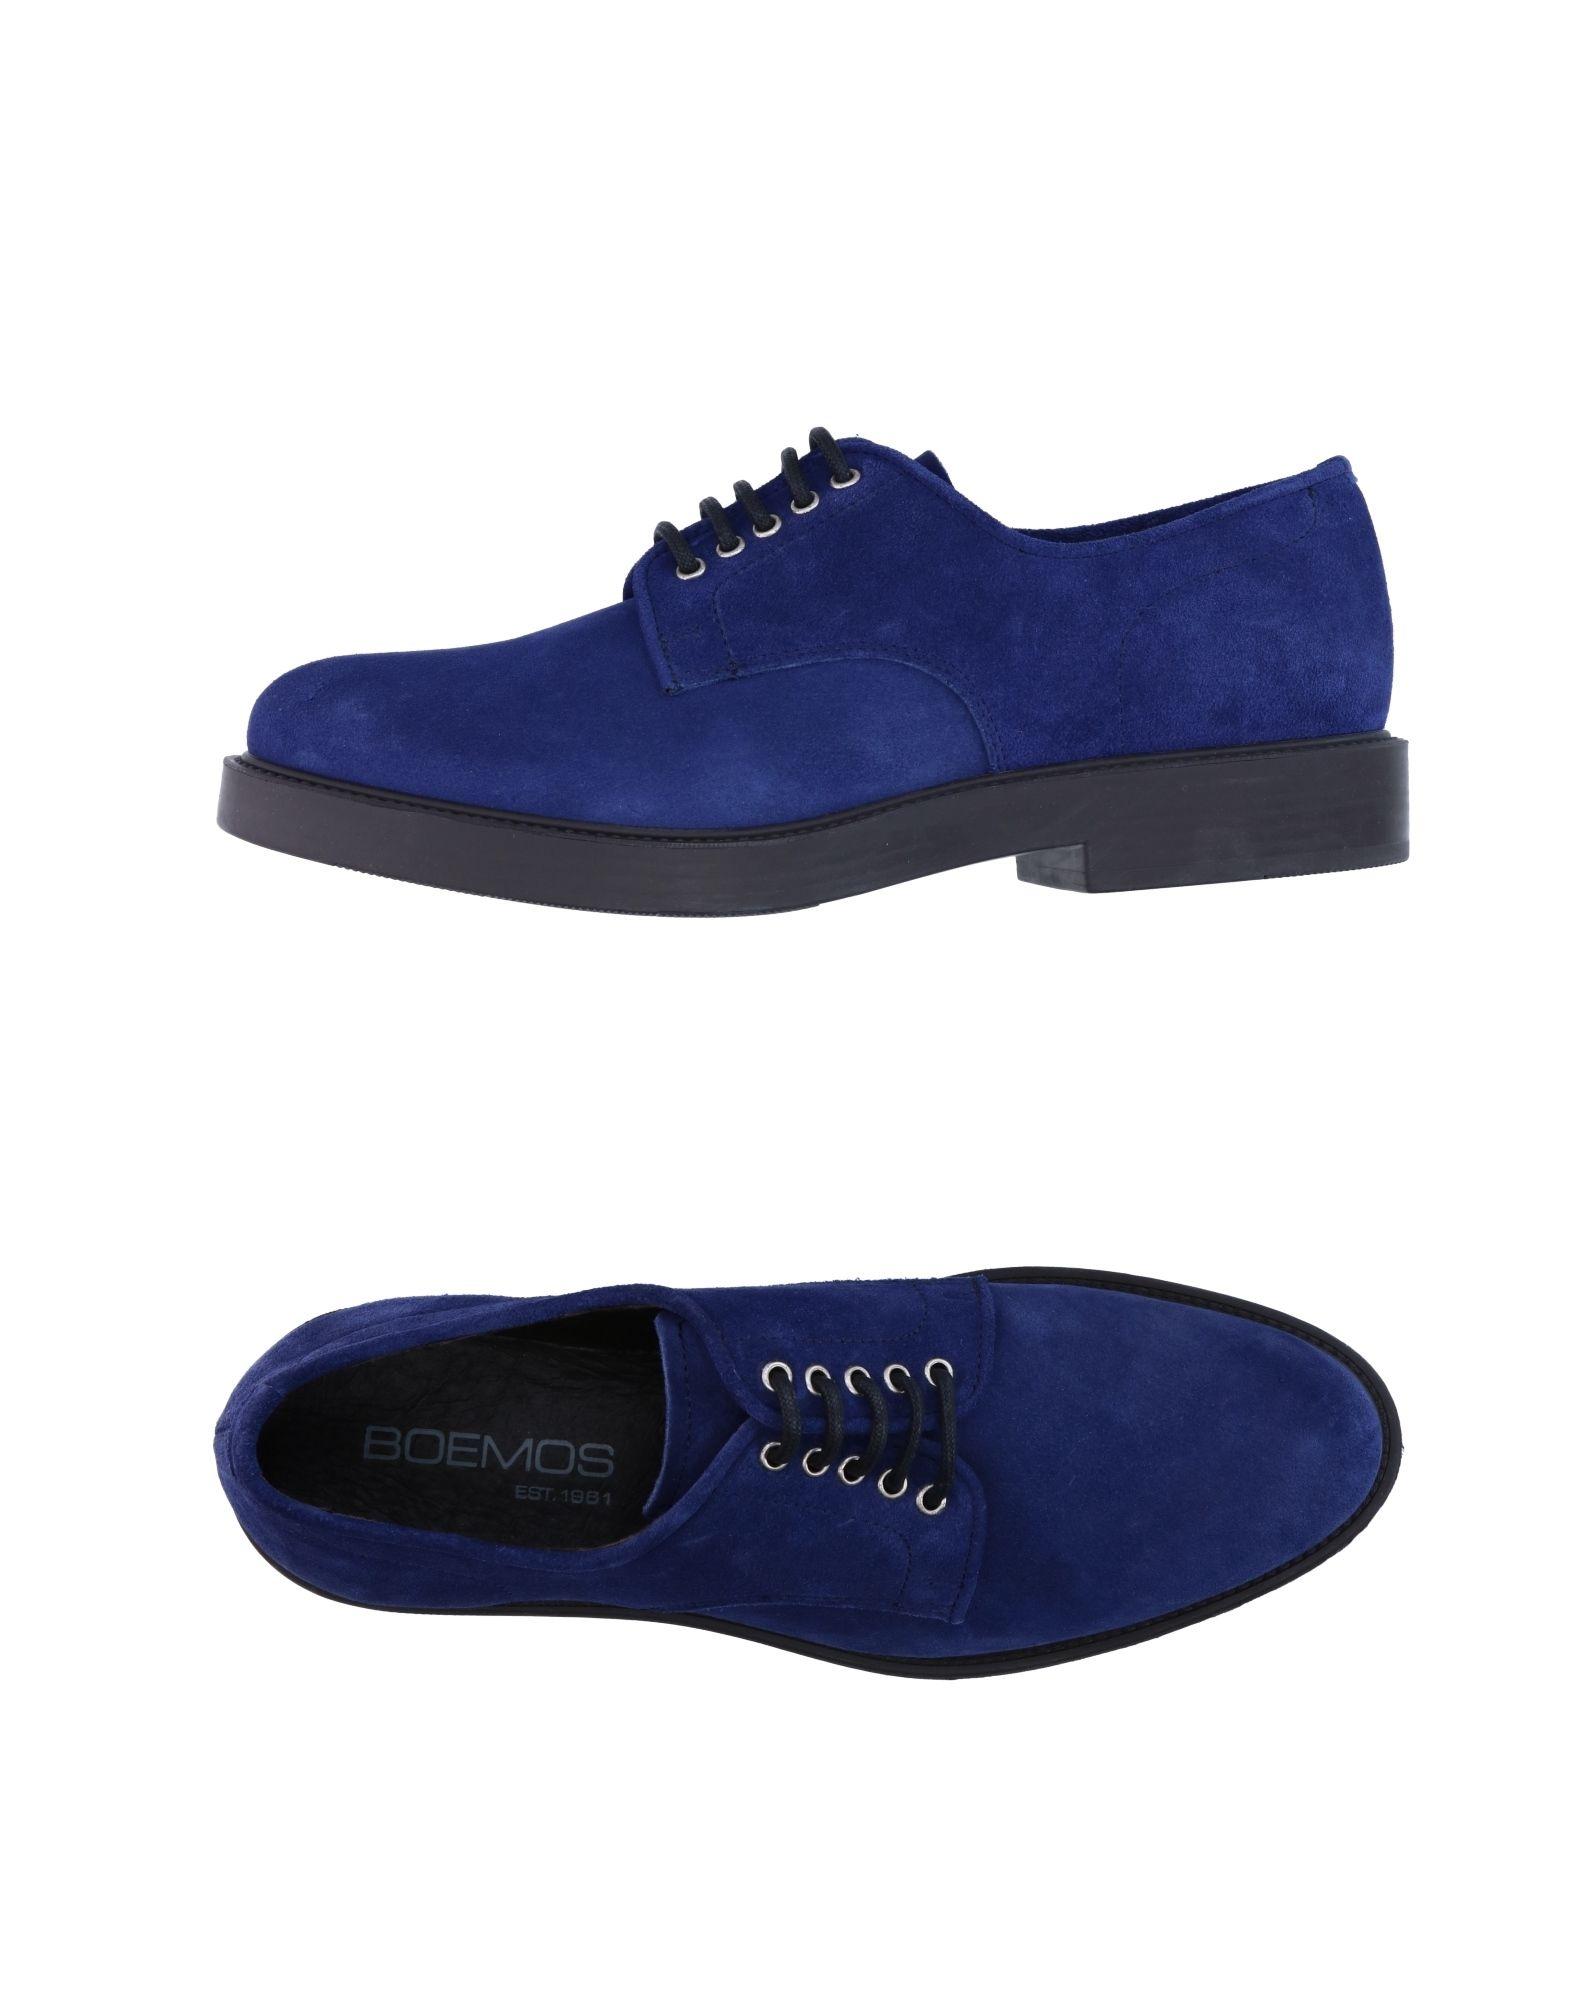 Фотография BOEMOS Обувь на шнурках